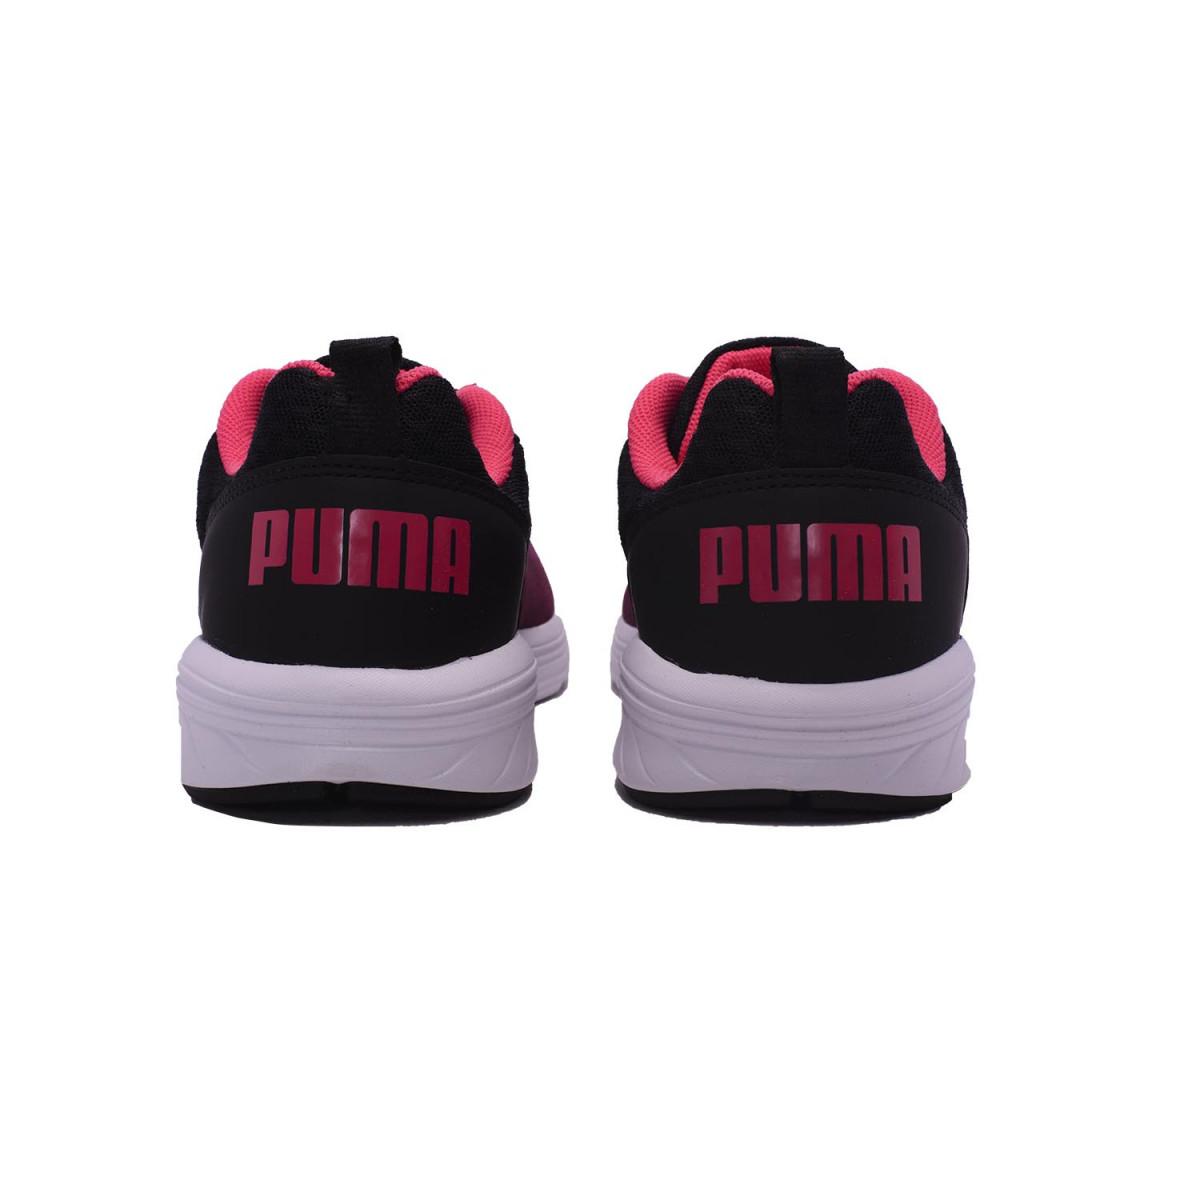 5593d606a Zapatillas Puma Comet - Puma hasta 40% OFF - Rebajas